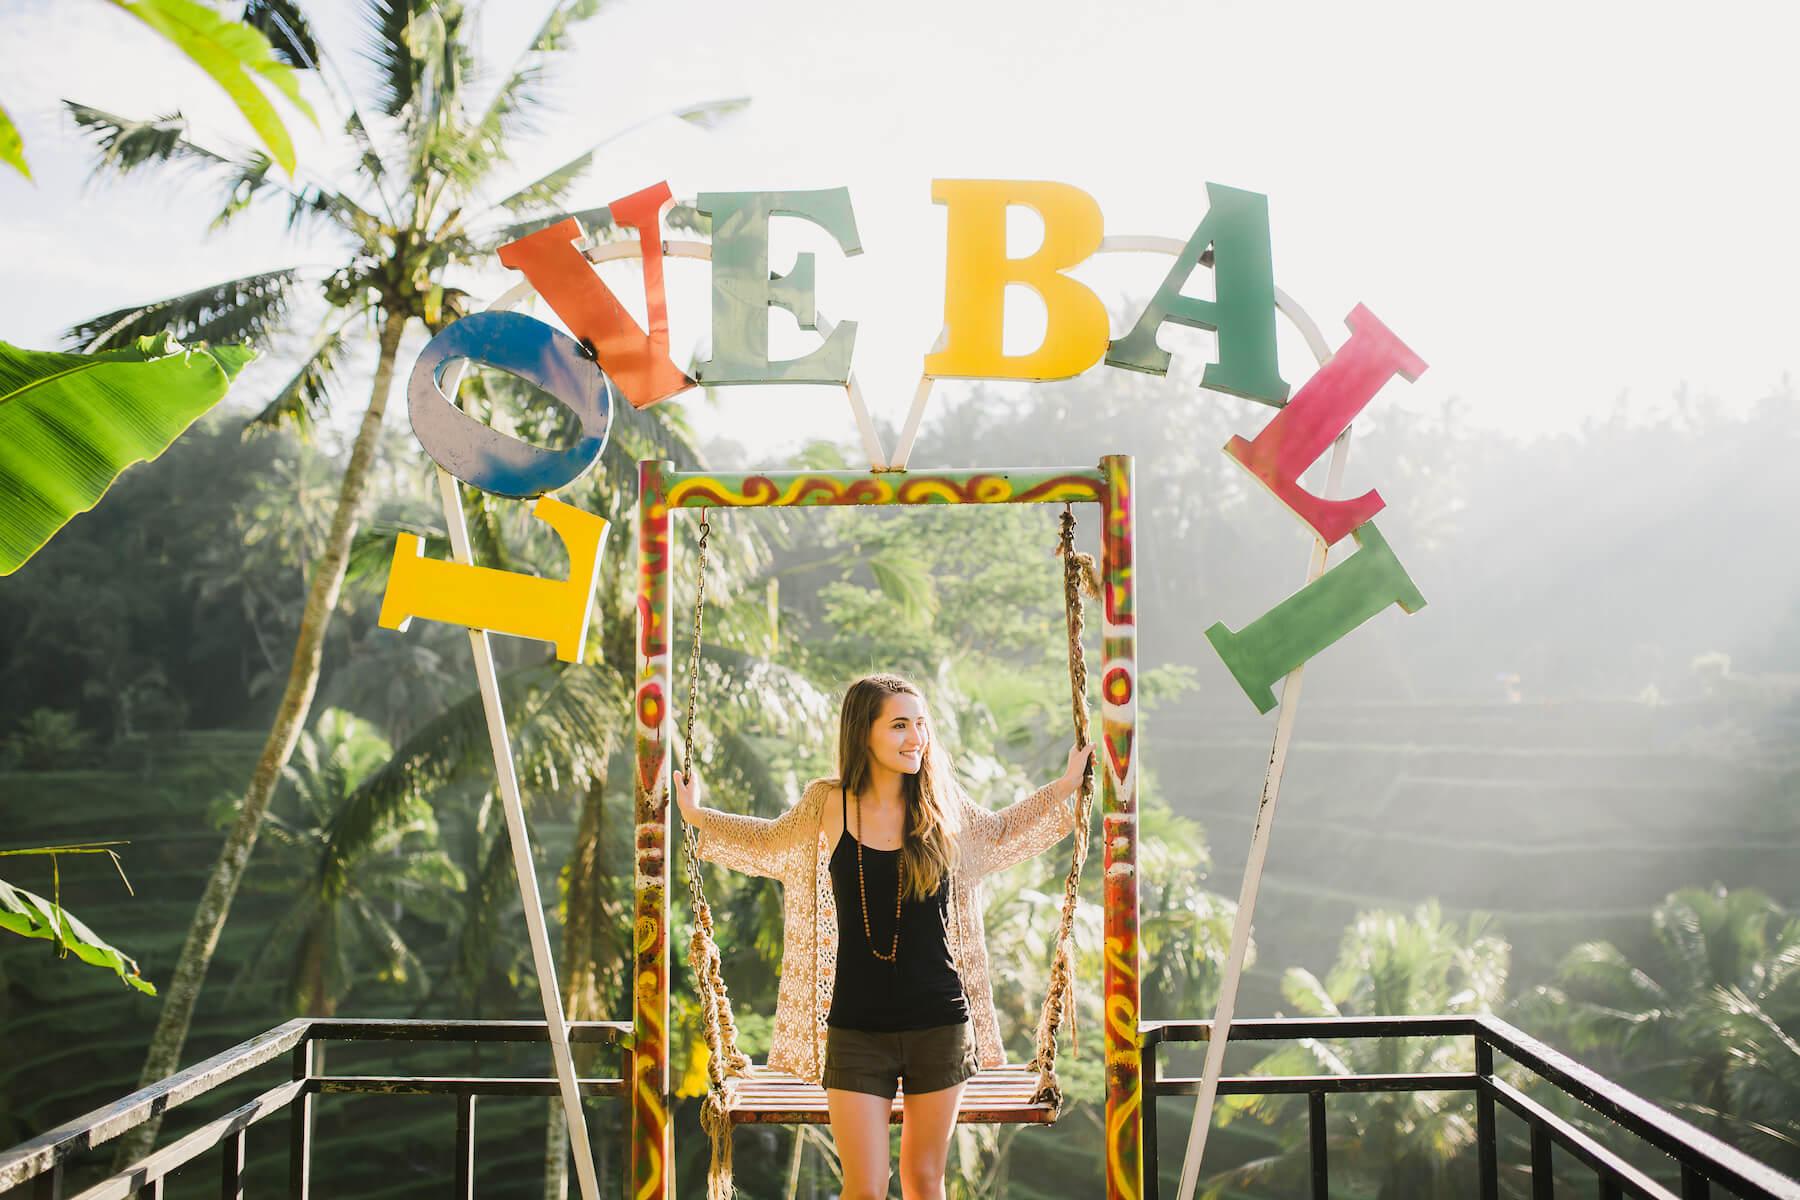 Solo traveler in Bali Indonesia